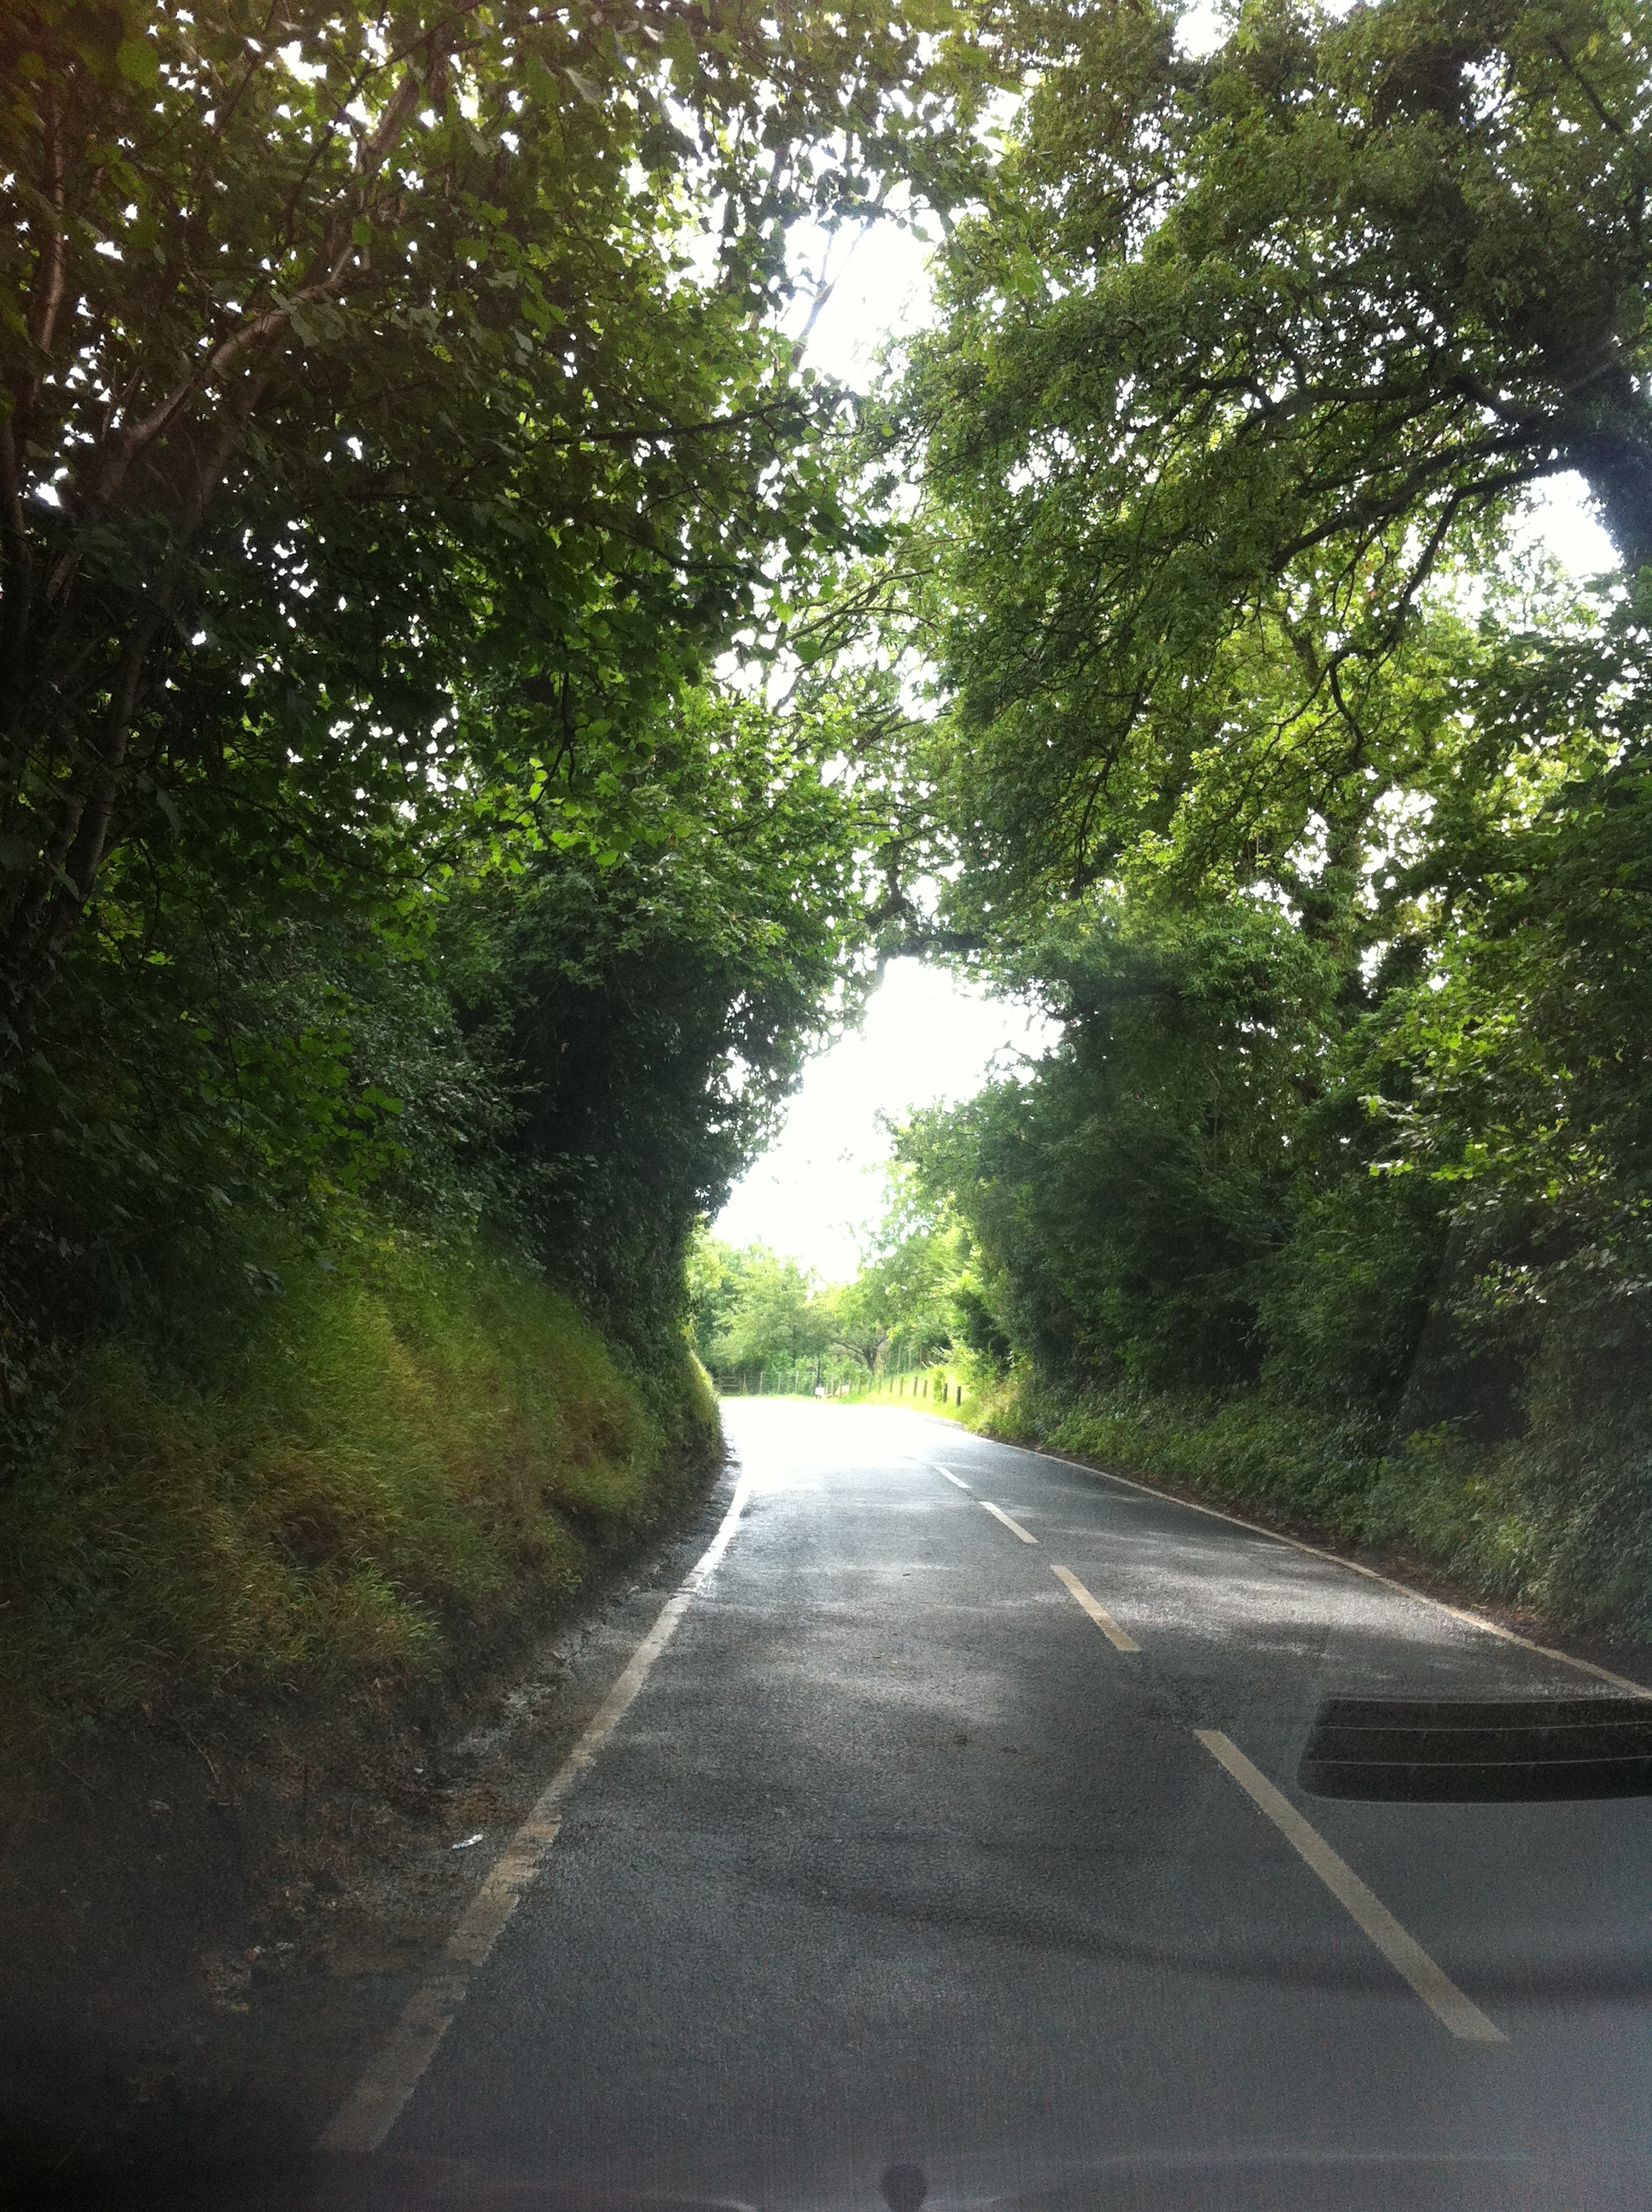 A summertime trip through the narrow roads of Kent, UK